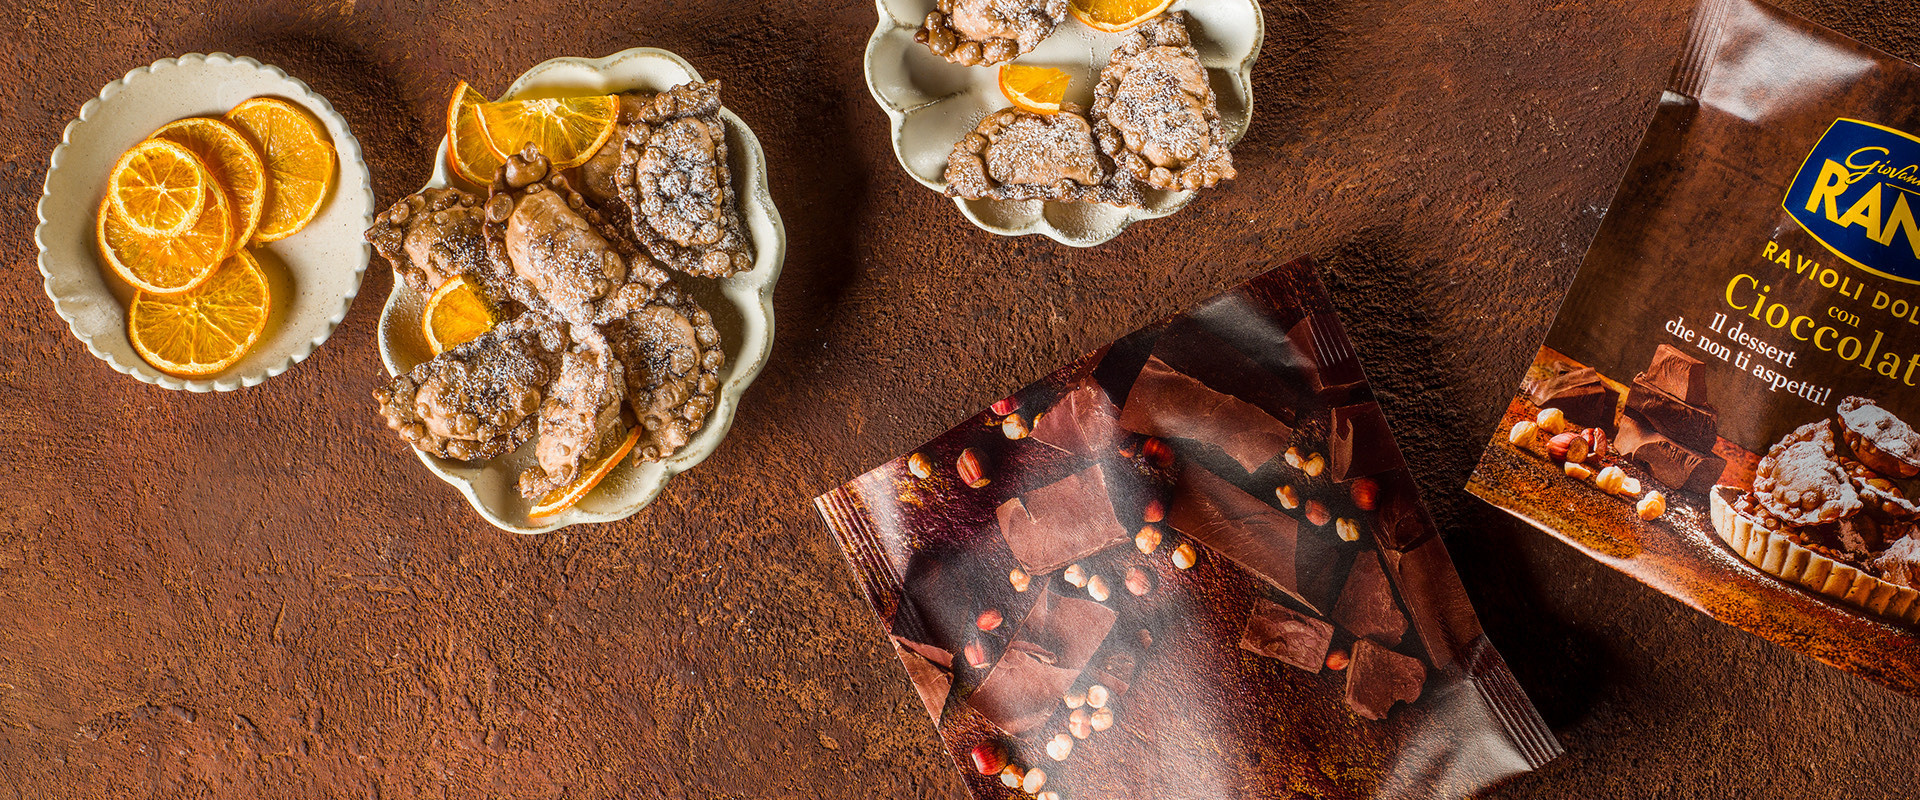 IT-ricette-ravioli-cioccolato-arancia-D.jpg